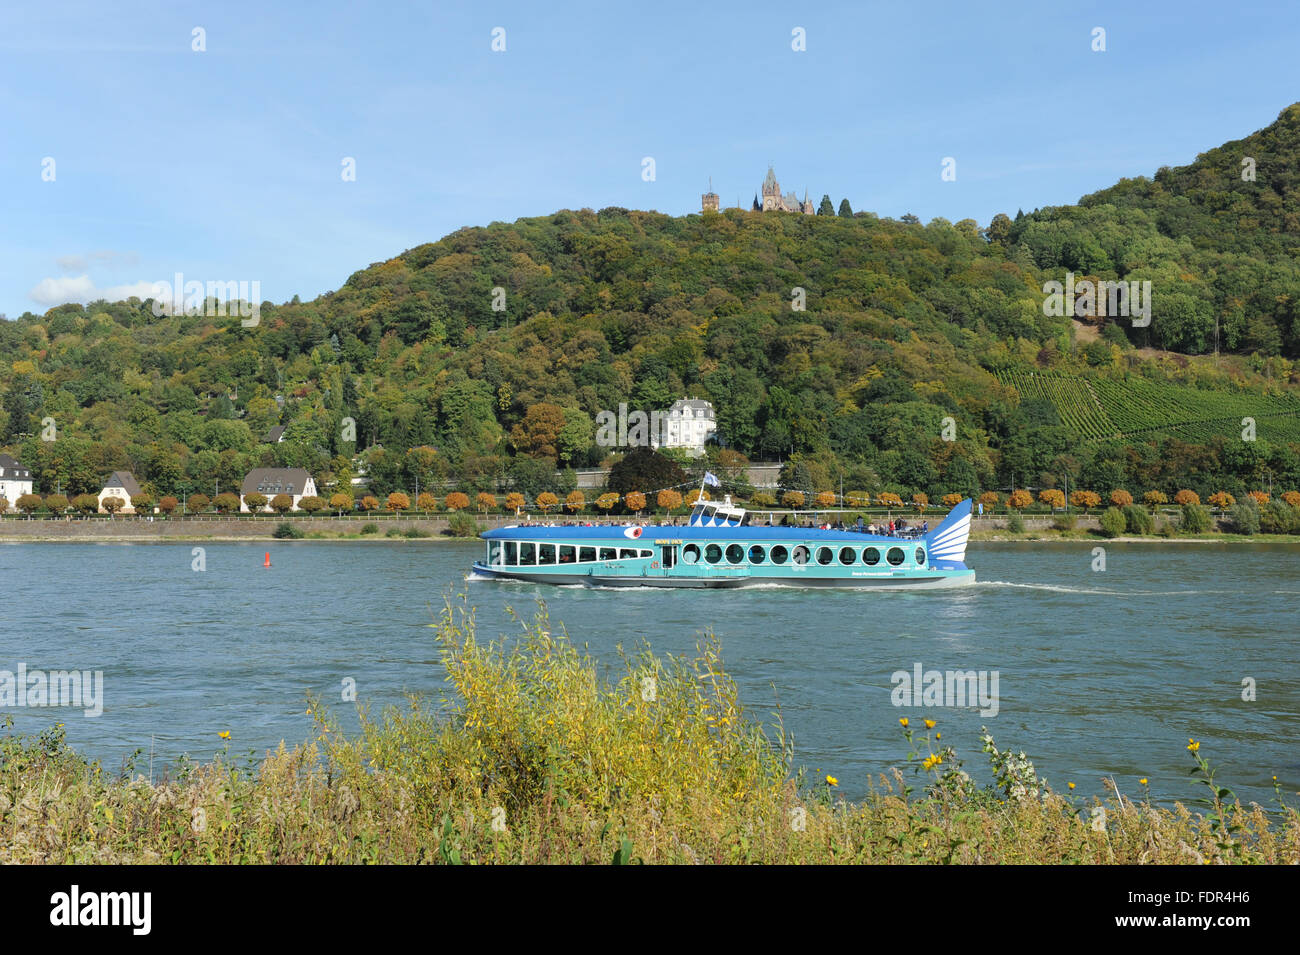 rhine river,pleasure boat,drachenburg castle - Stock Image